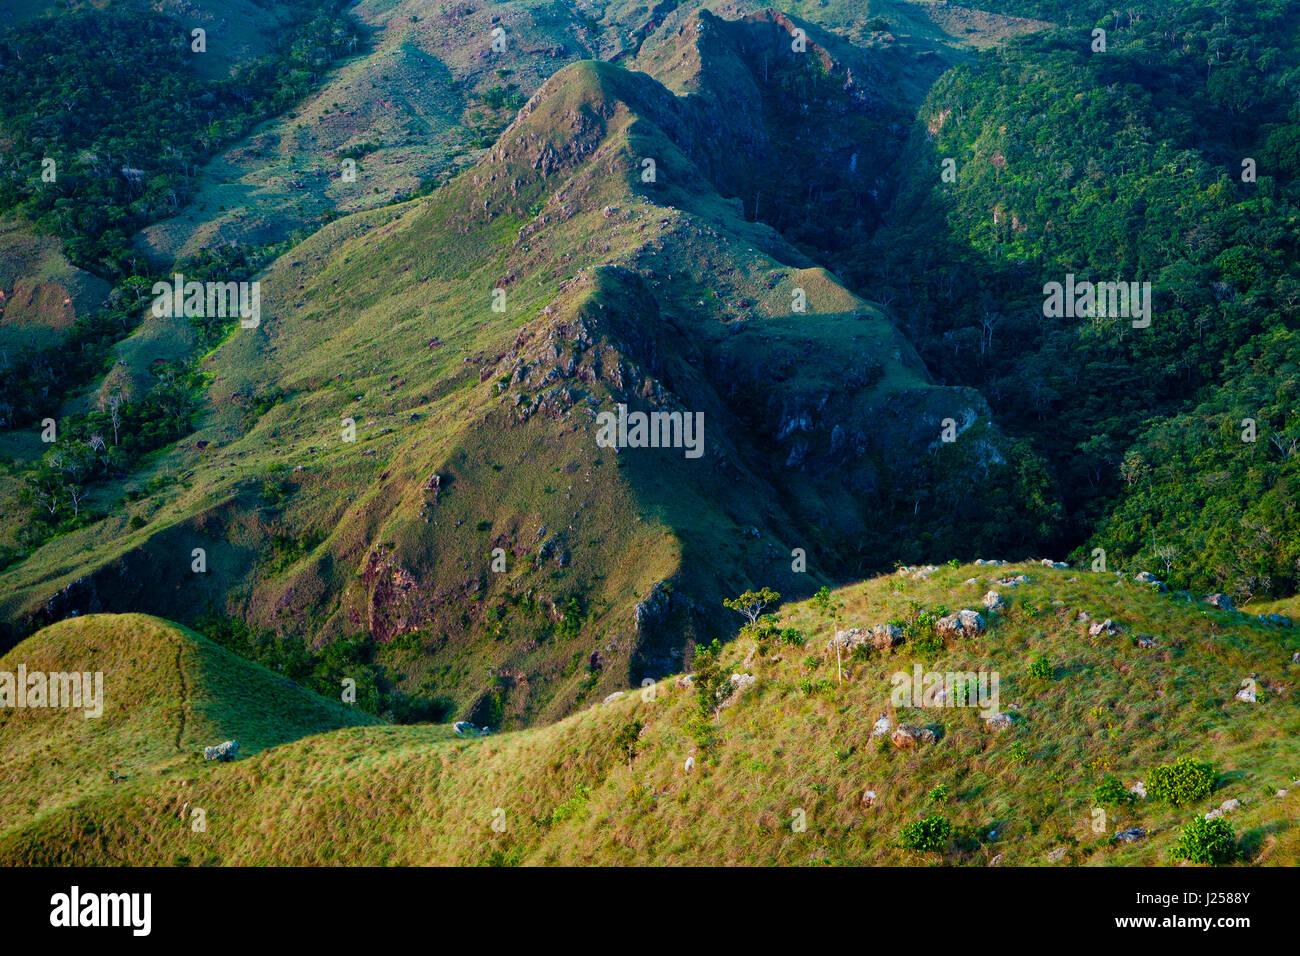 Landscape in Altos de Campana National Park, Republic of Panama - Stock-Bilder